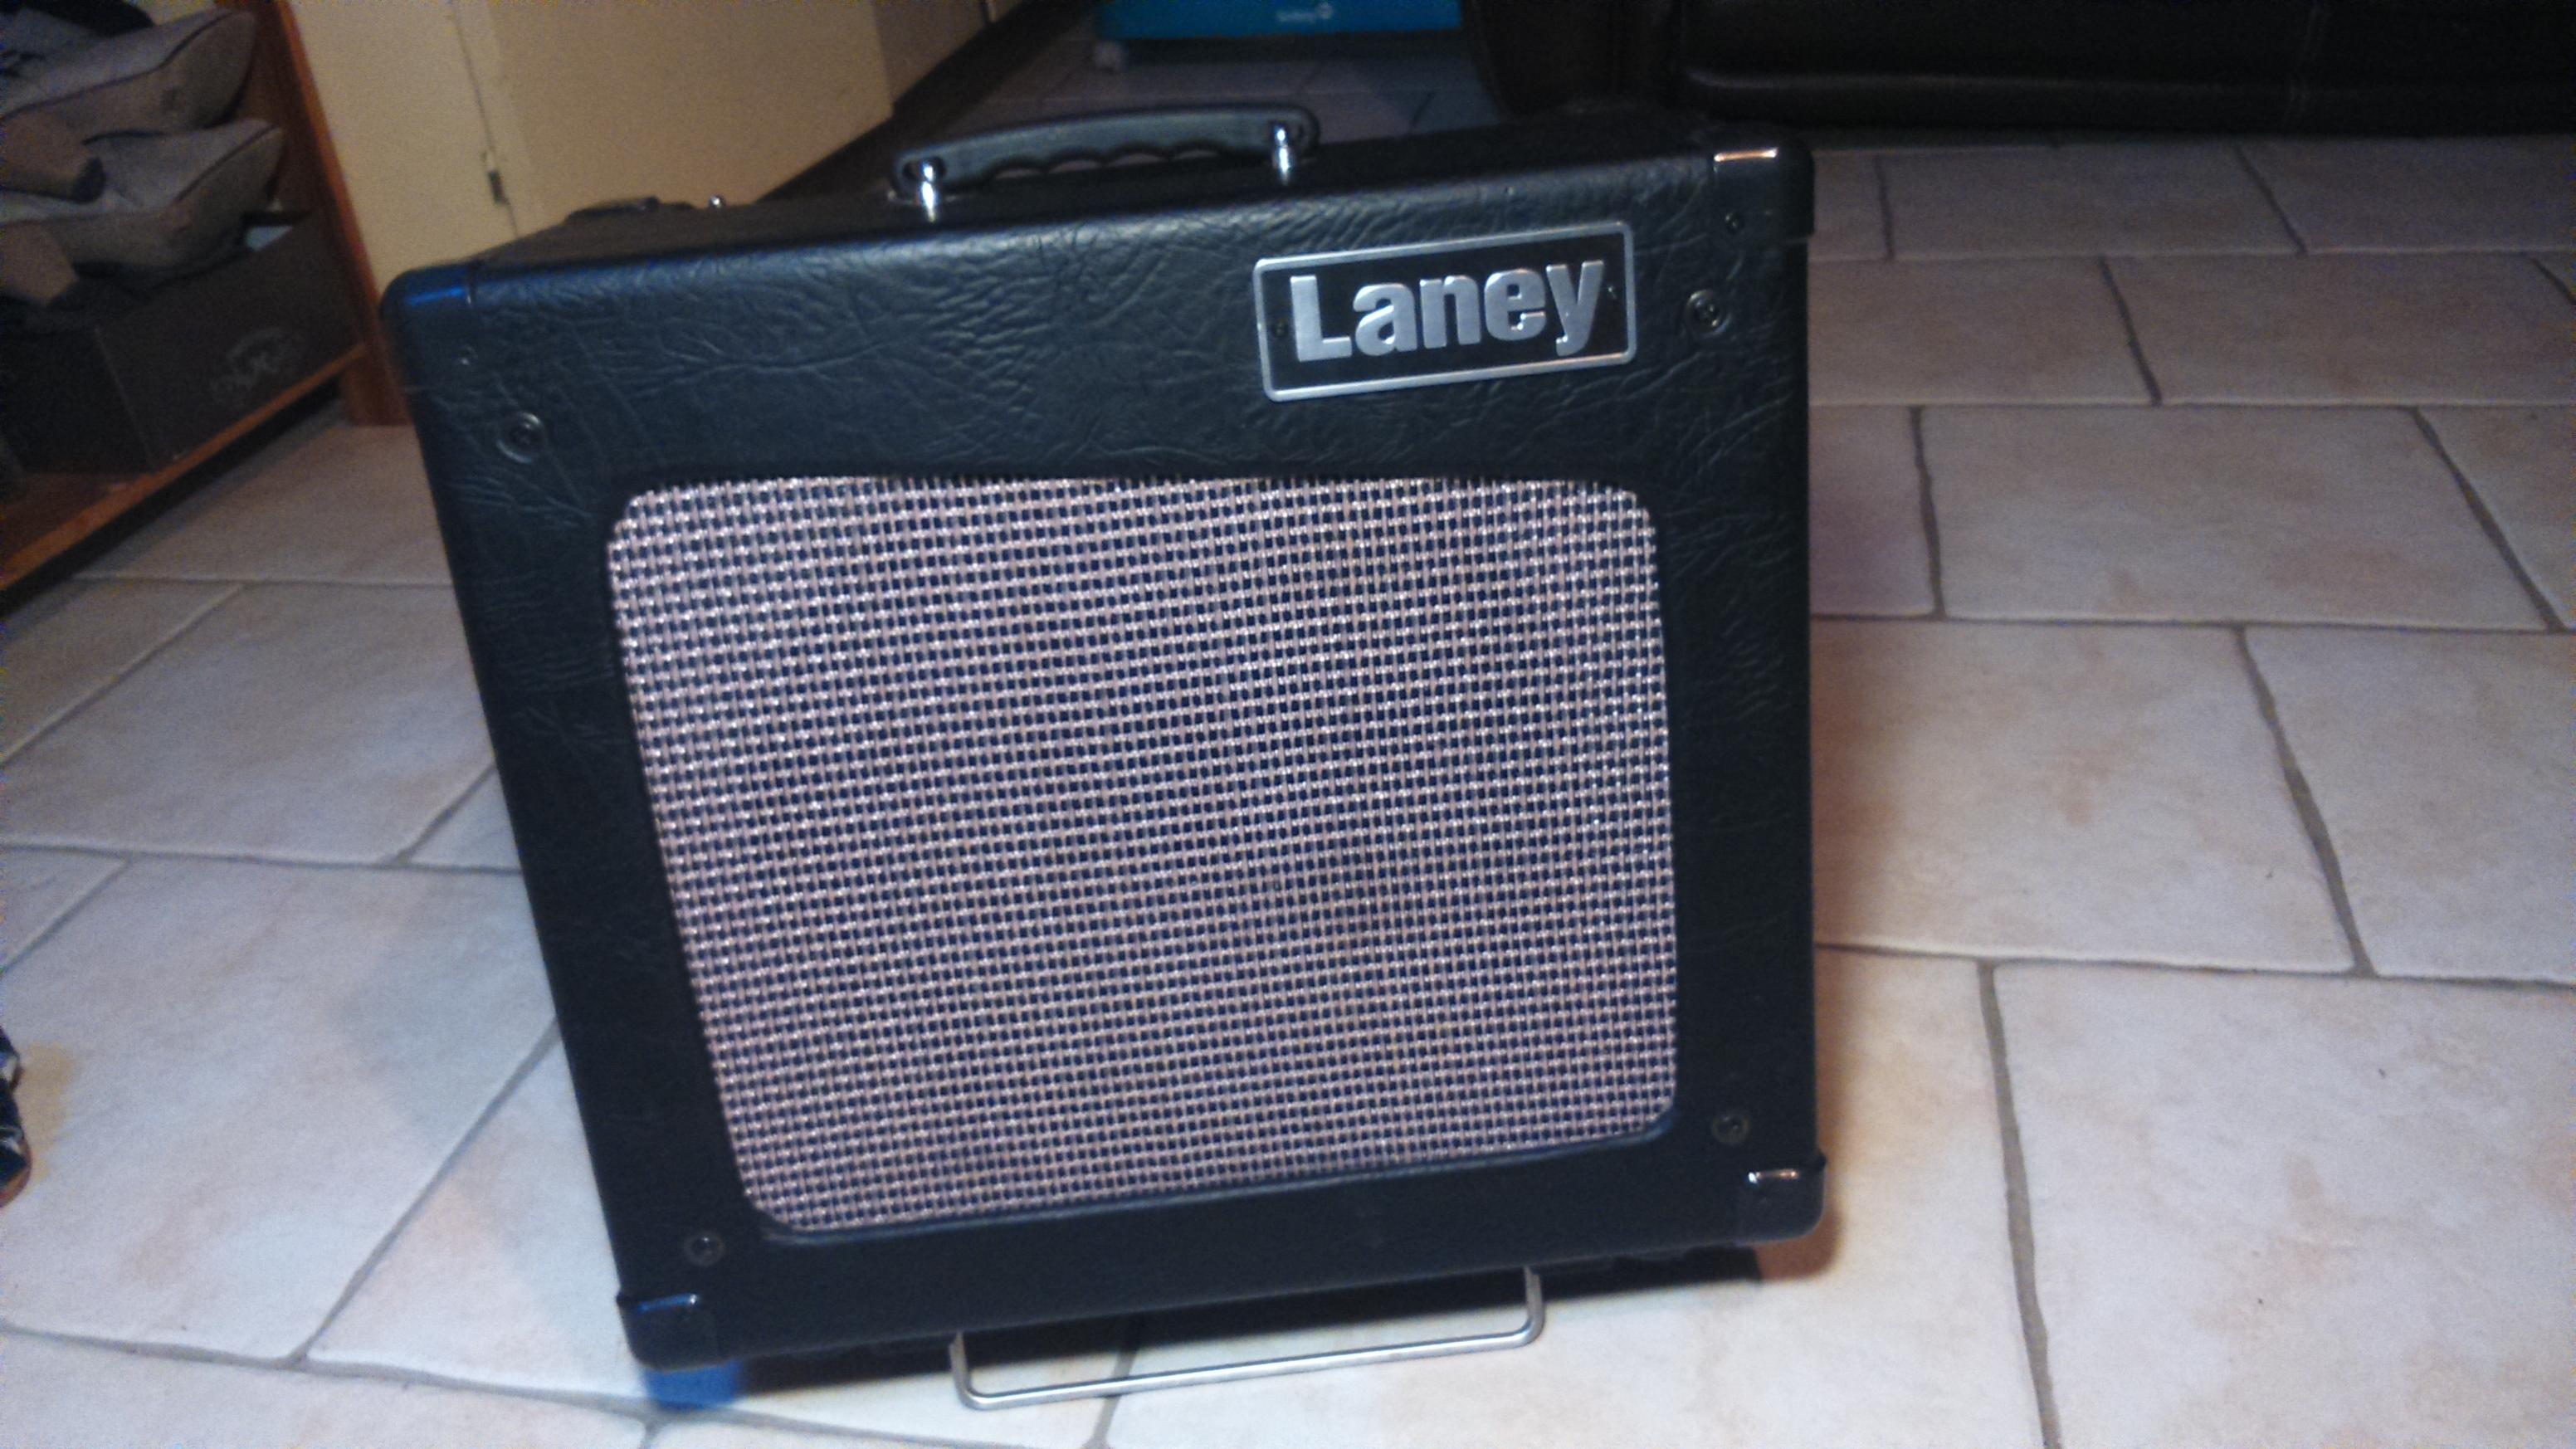 laney cub12r image 1169530 audiofanzine. Black Bedroom Furniture Sets. Home Design Ideas